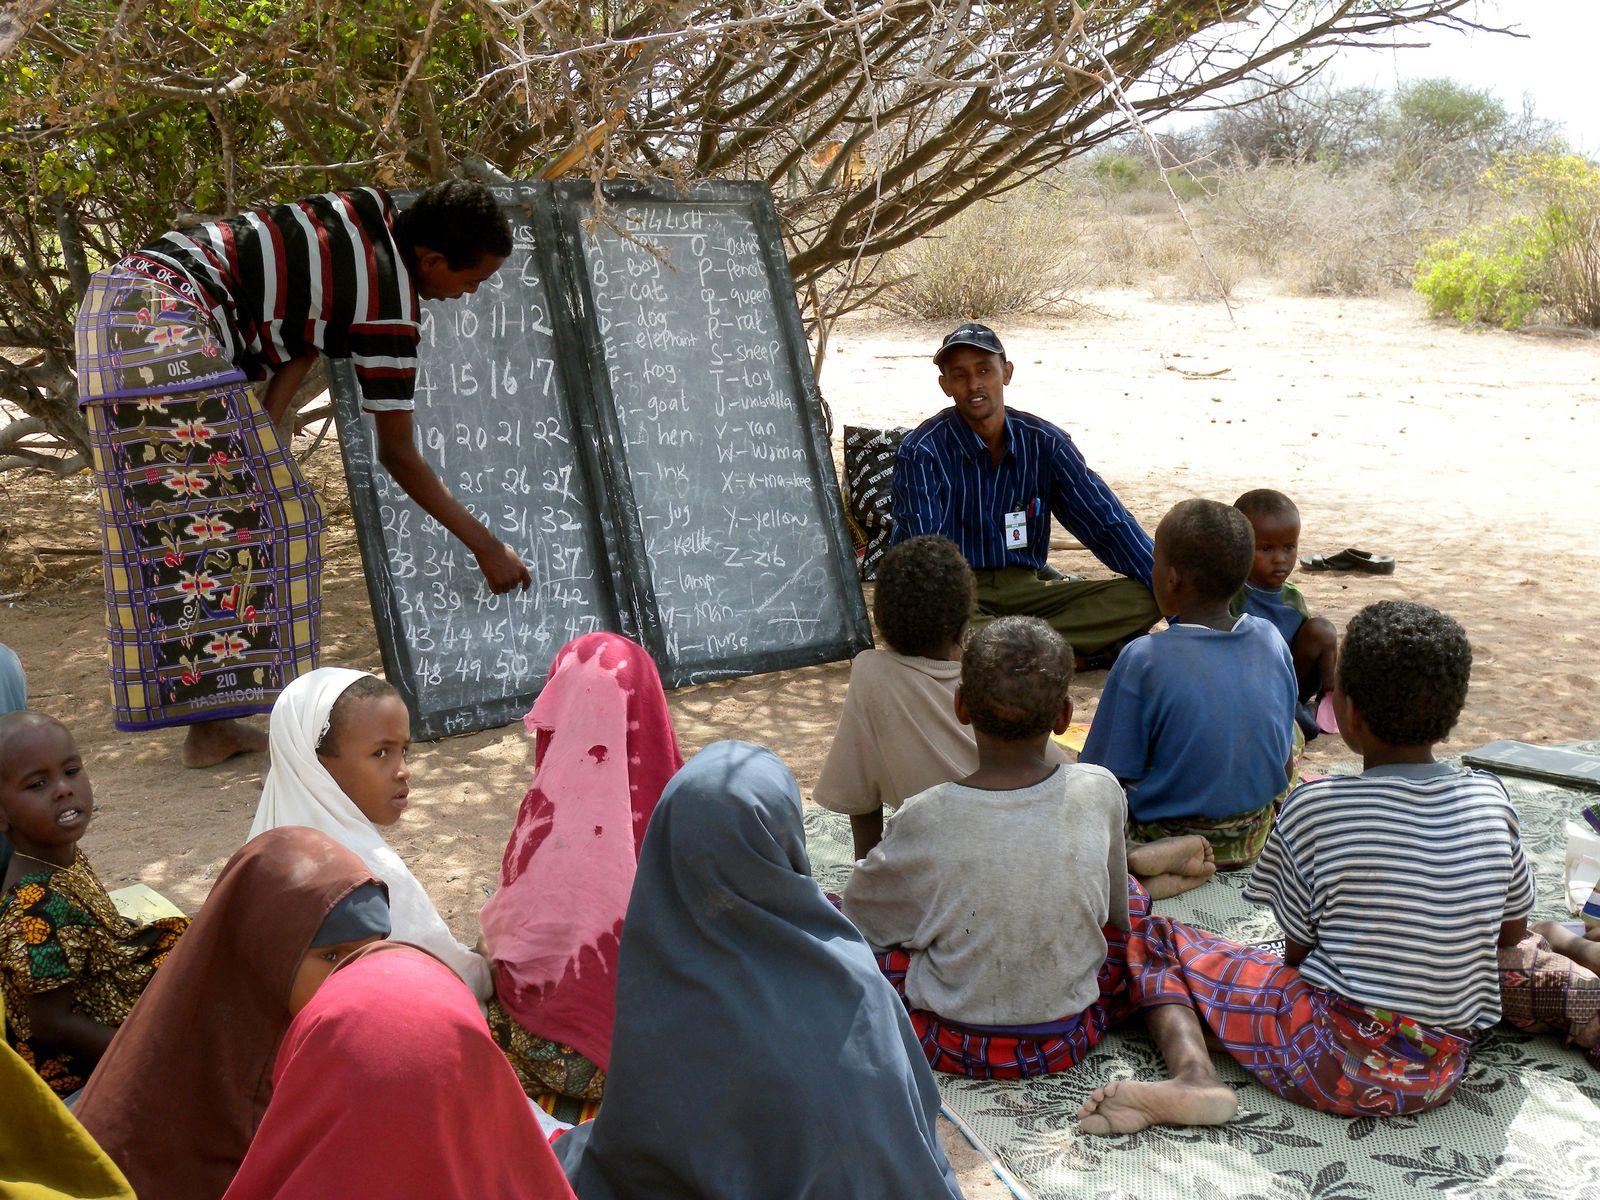 Nomadenschule in Kenia / Nomadenkinder